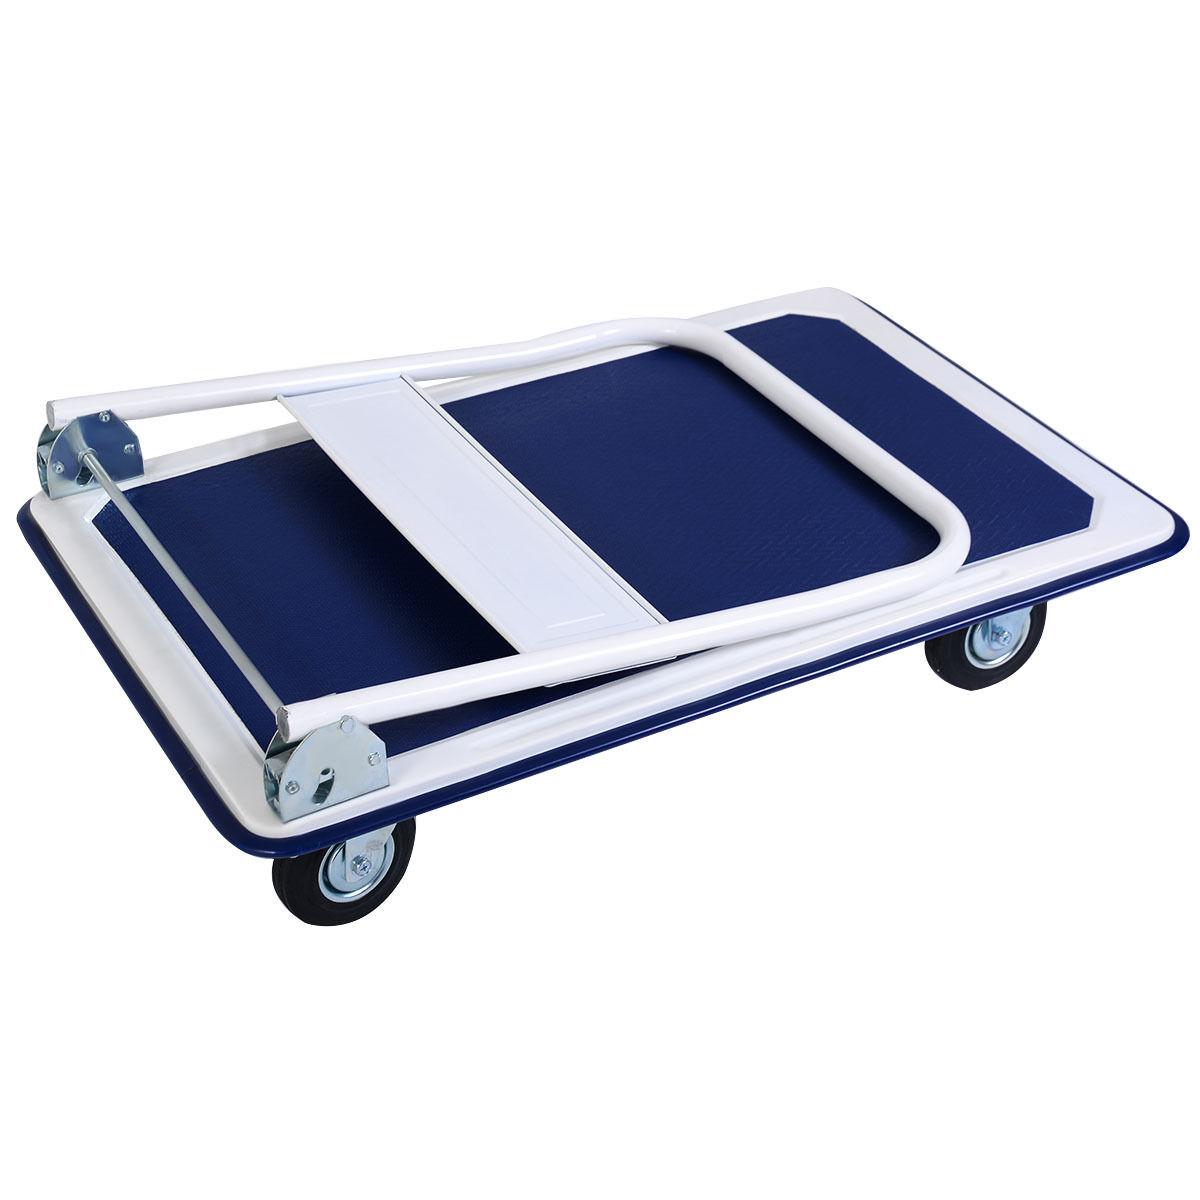 Backyard Pro Bsg12 Butcher Series 12 Electric Meat Grinder: 330lbs Platform Cart Dolly Folding Foldable Push Hand